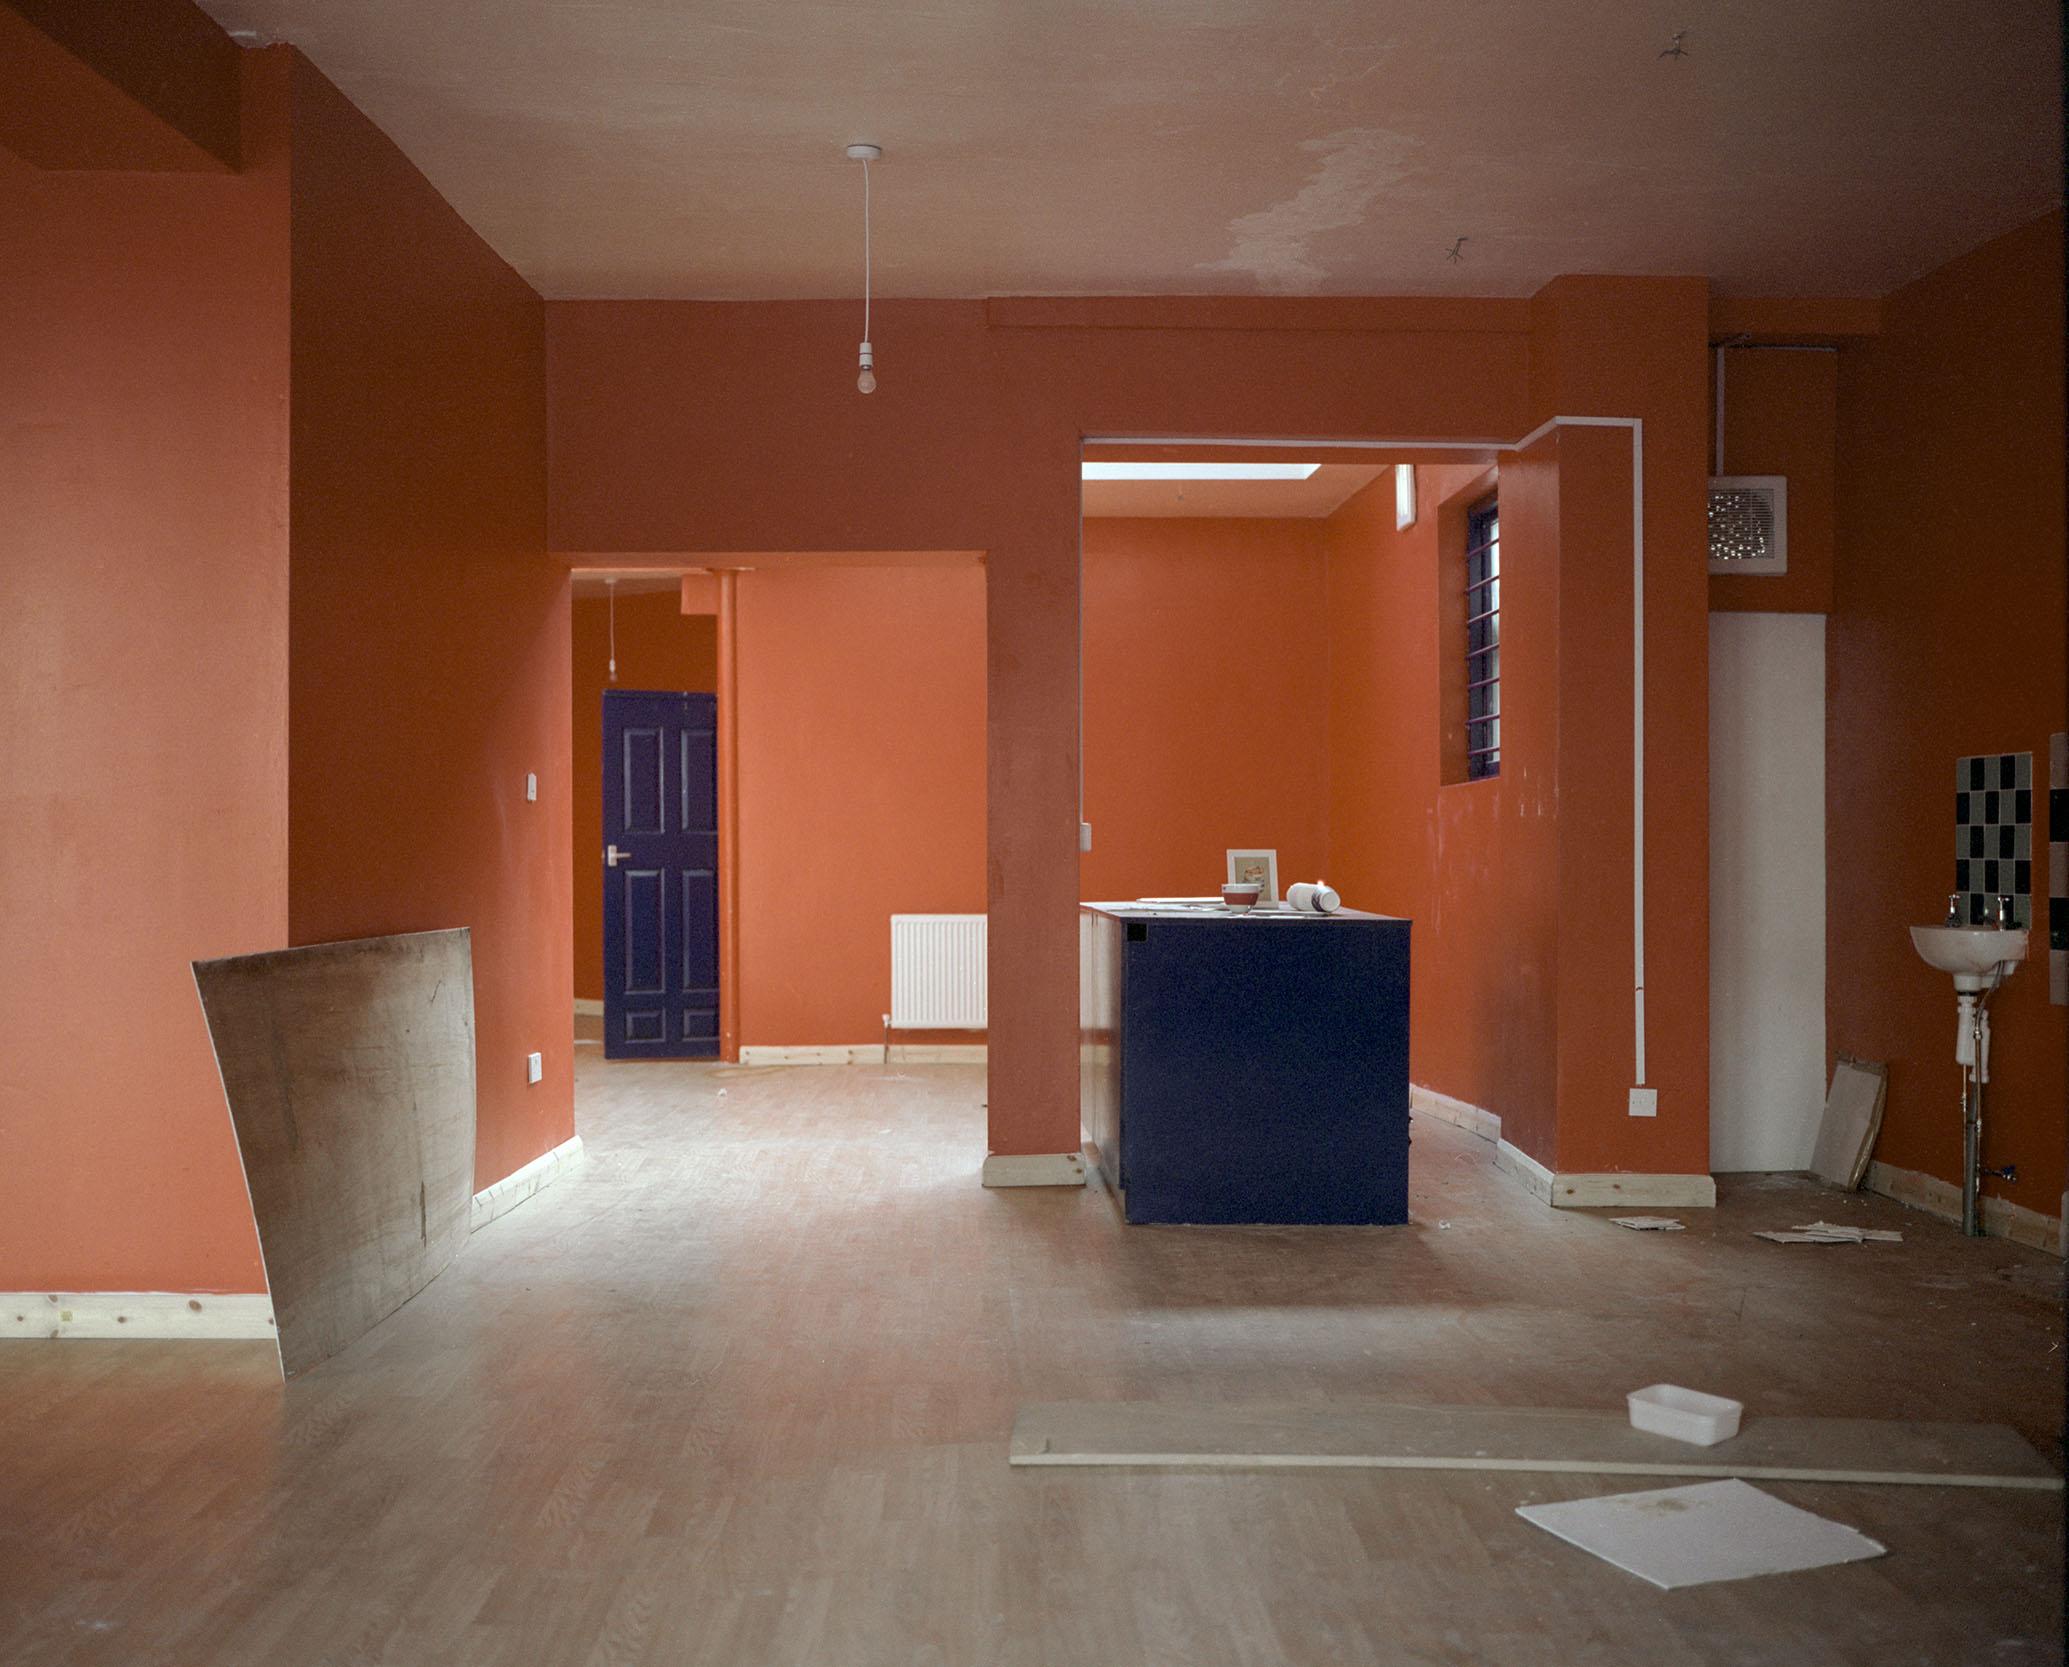 red room copy.jpg